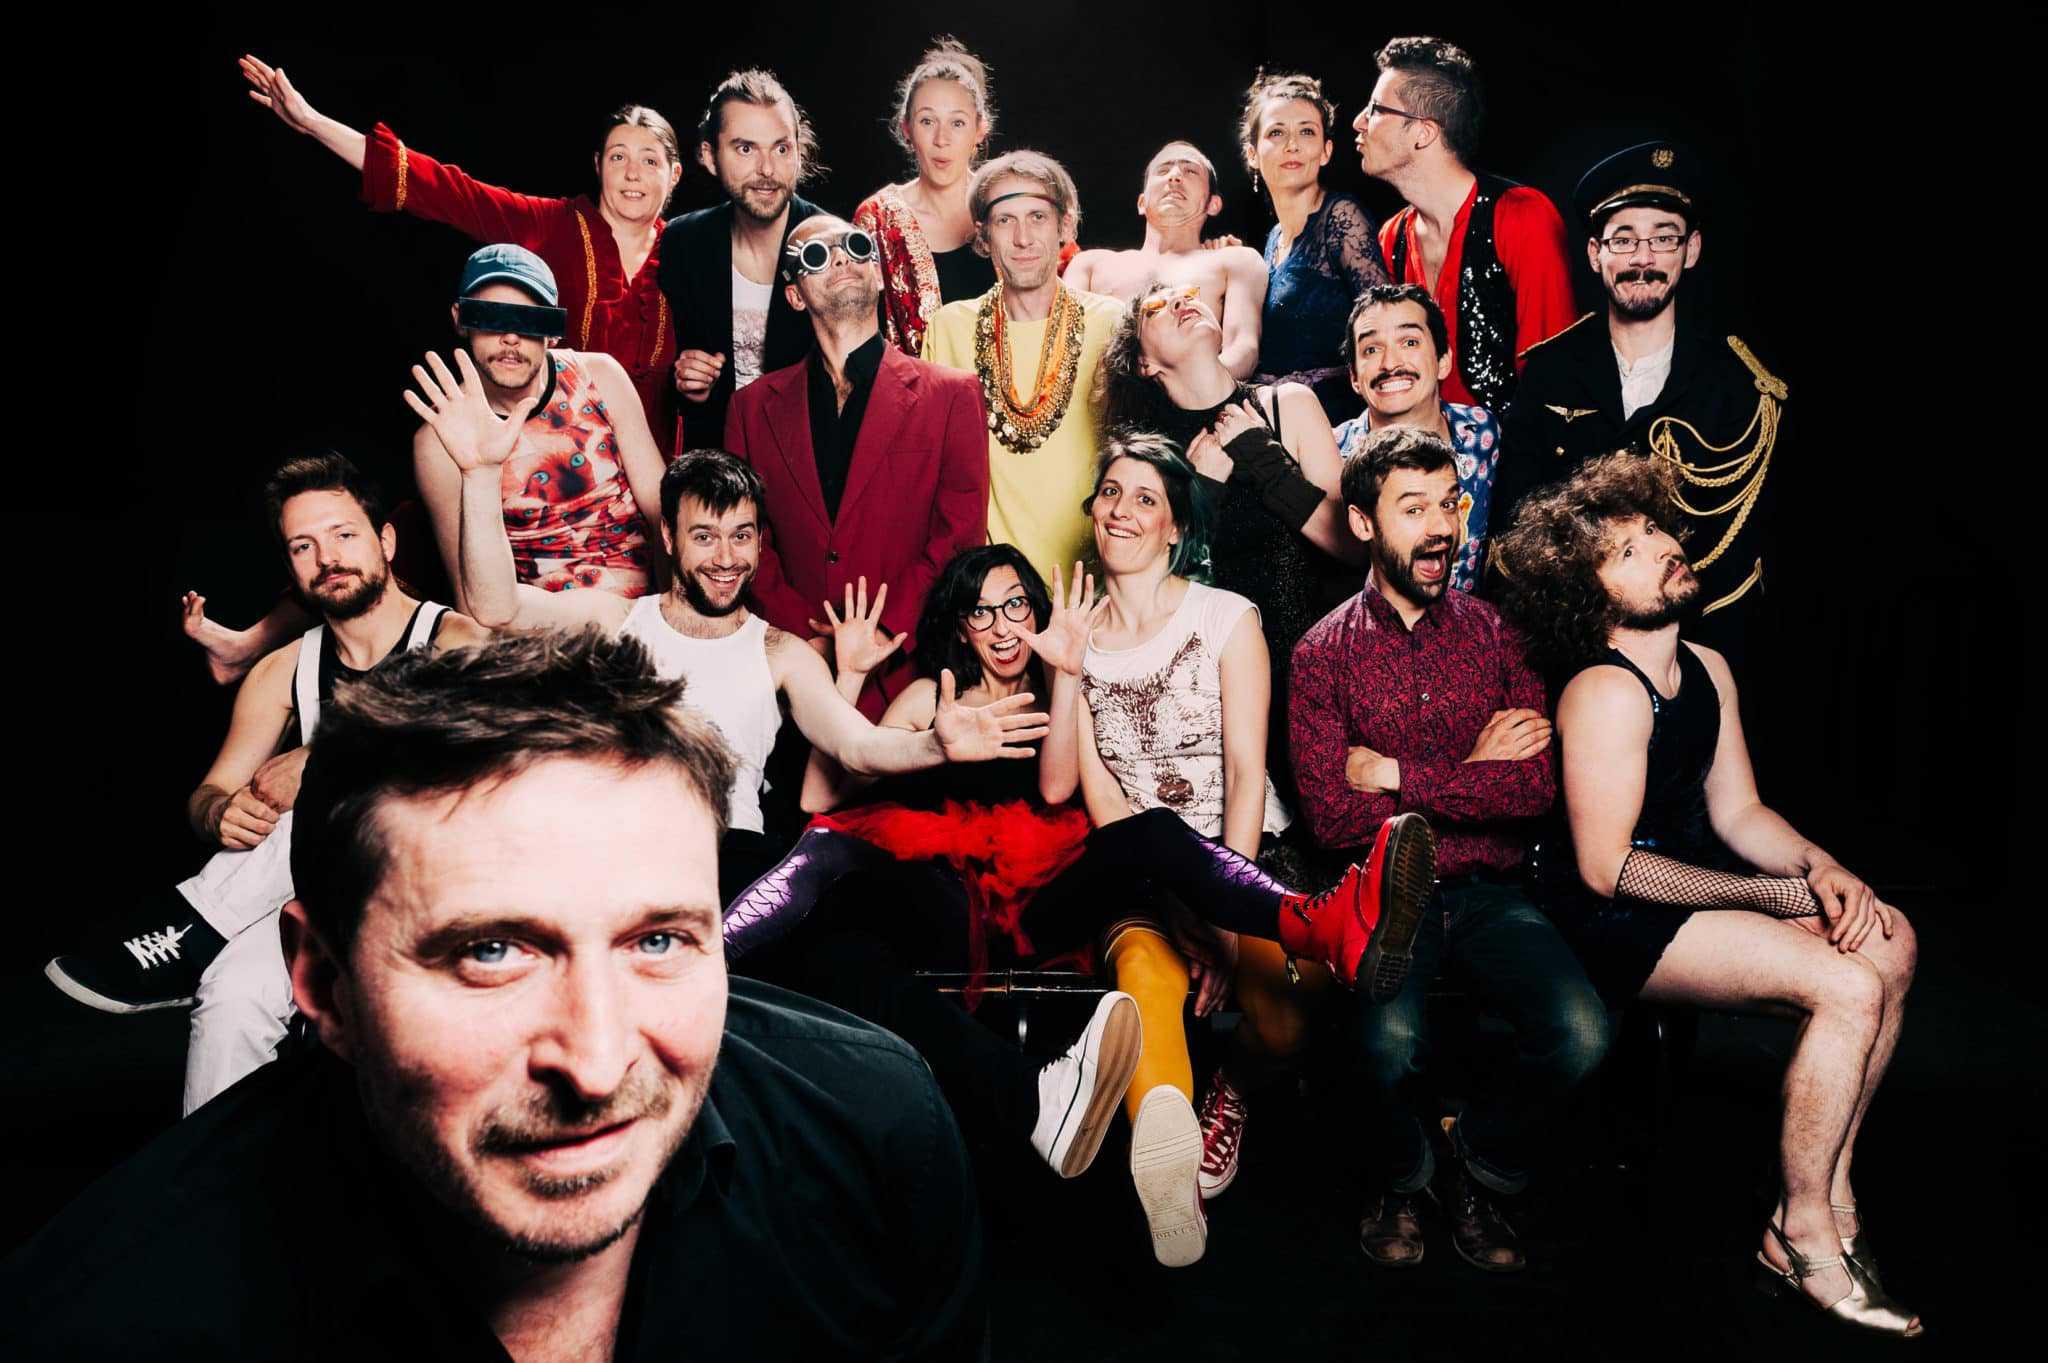 Loic Lantoine & The Very Big Experimental Toubifri Orchestra